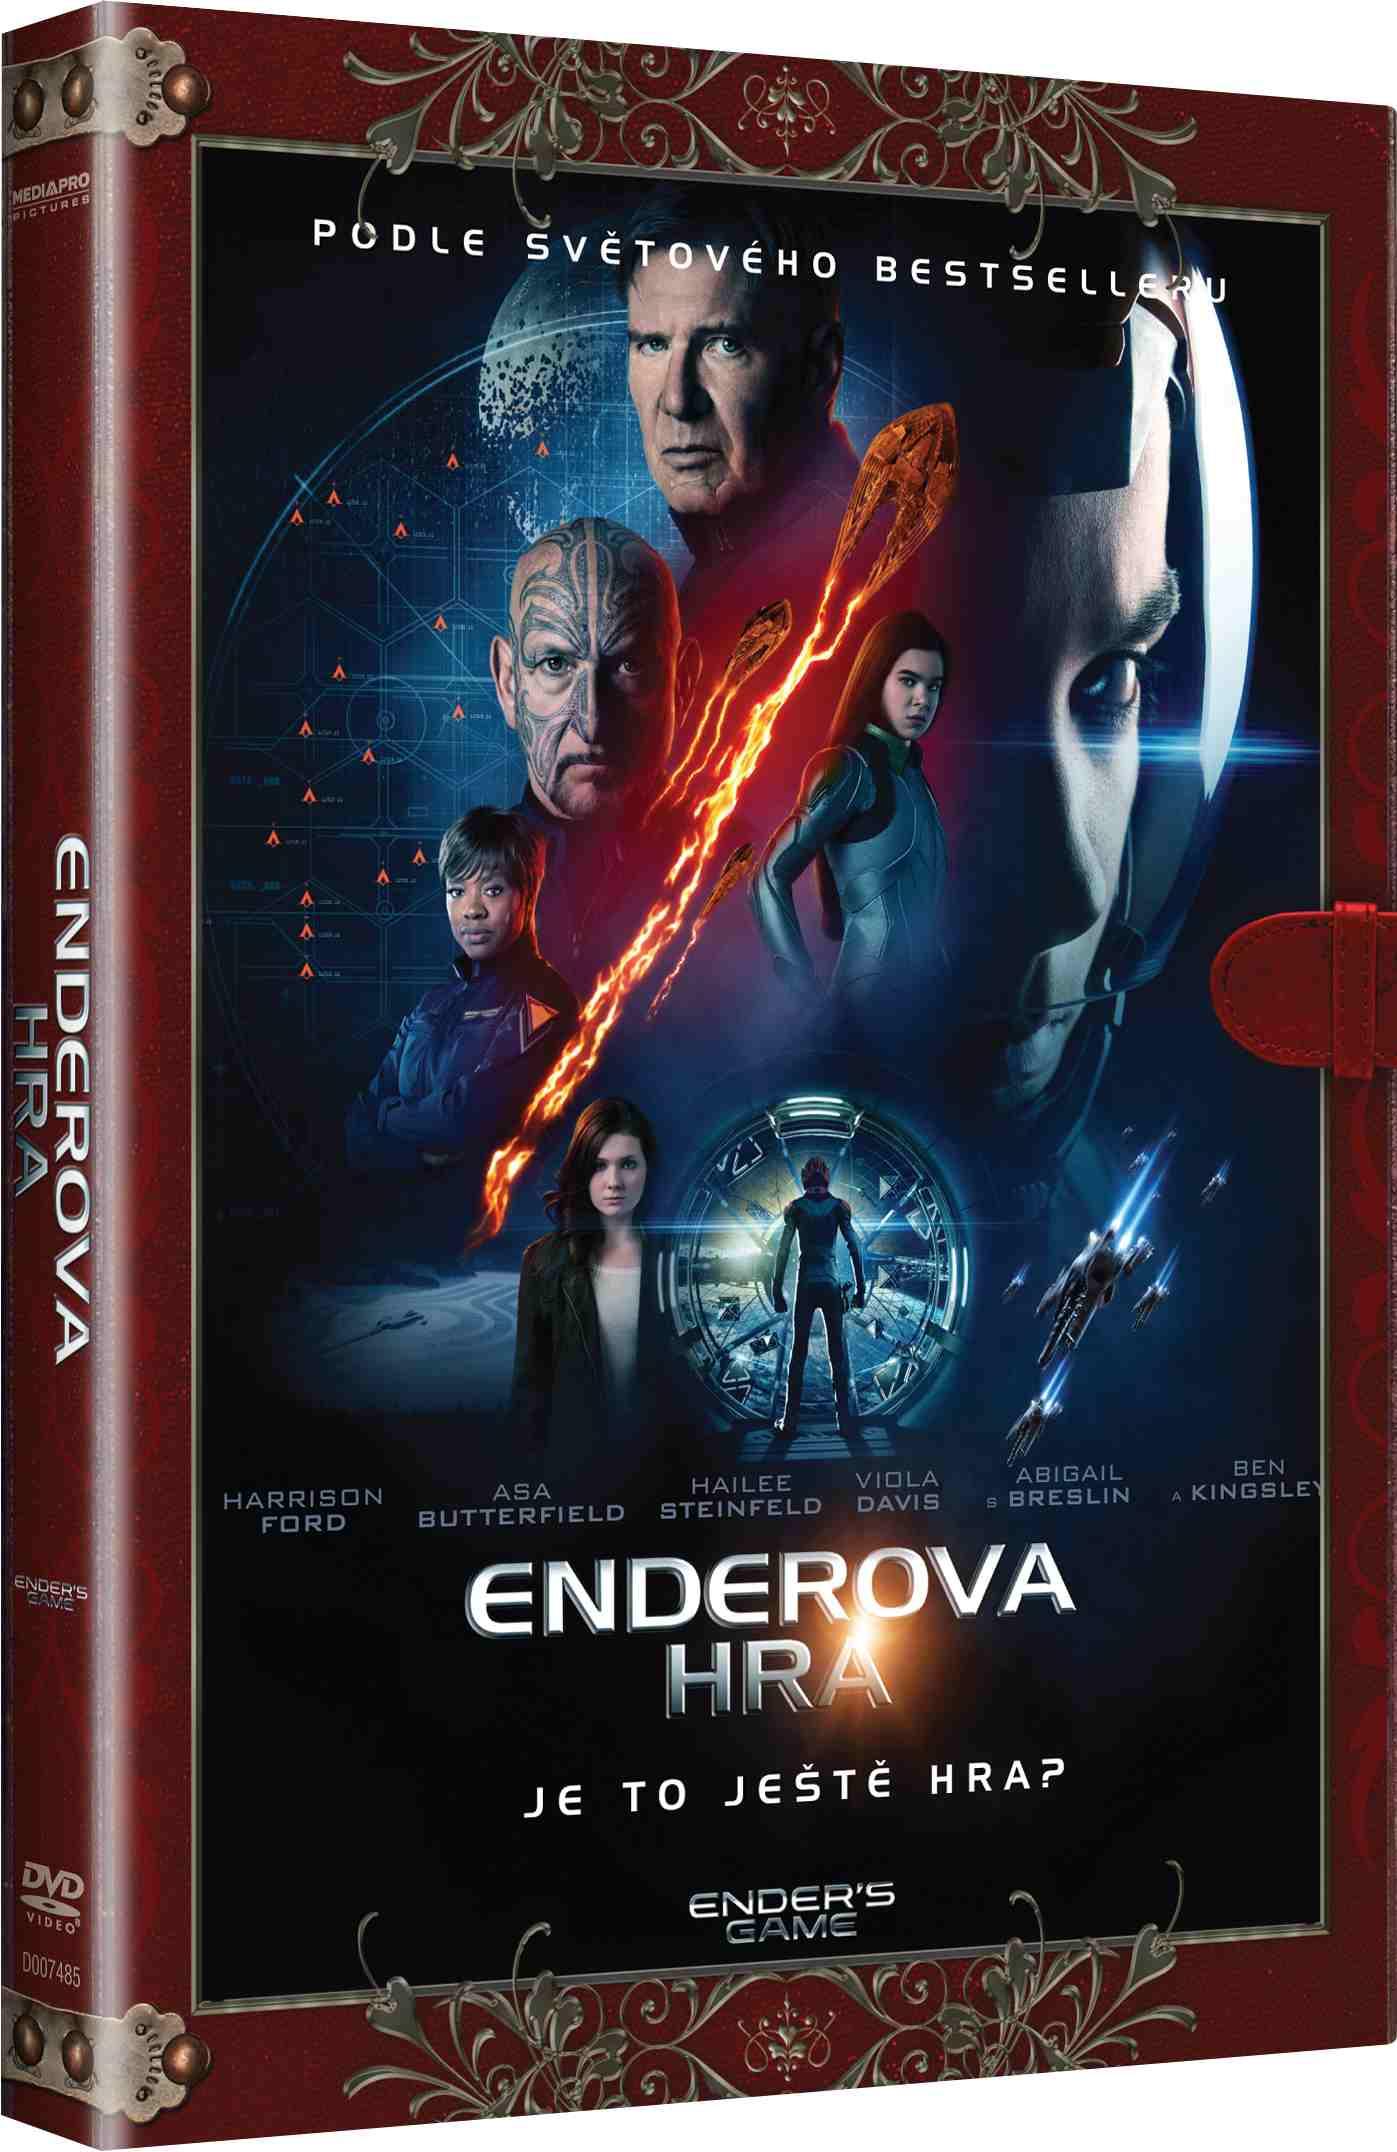 Enderova hra (Knižní edice) - DVD